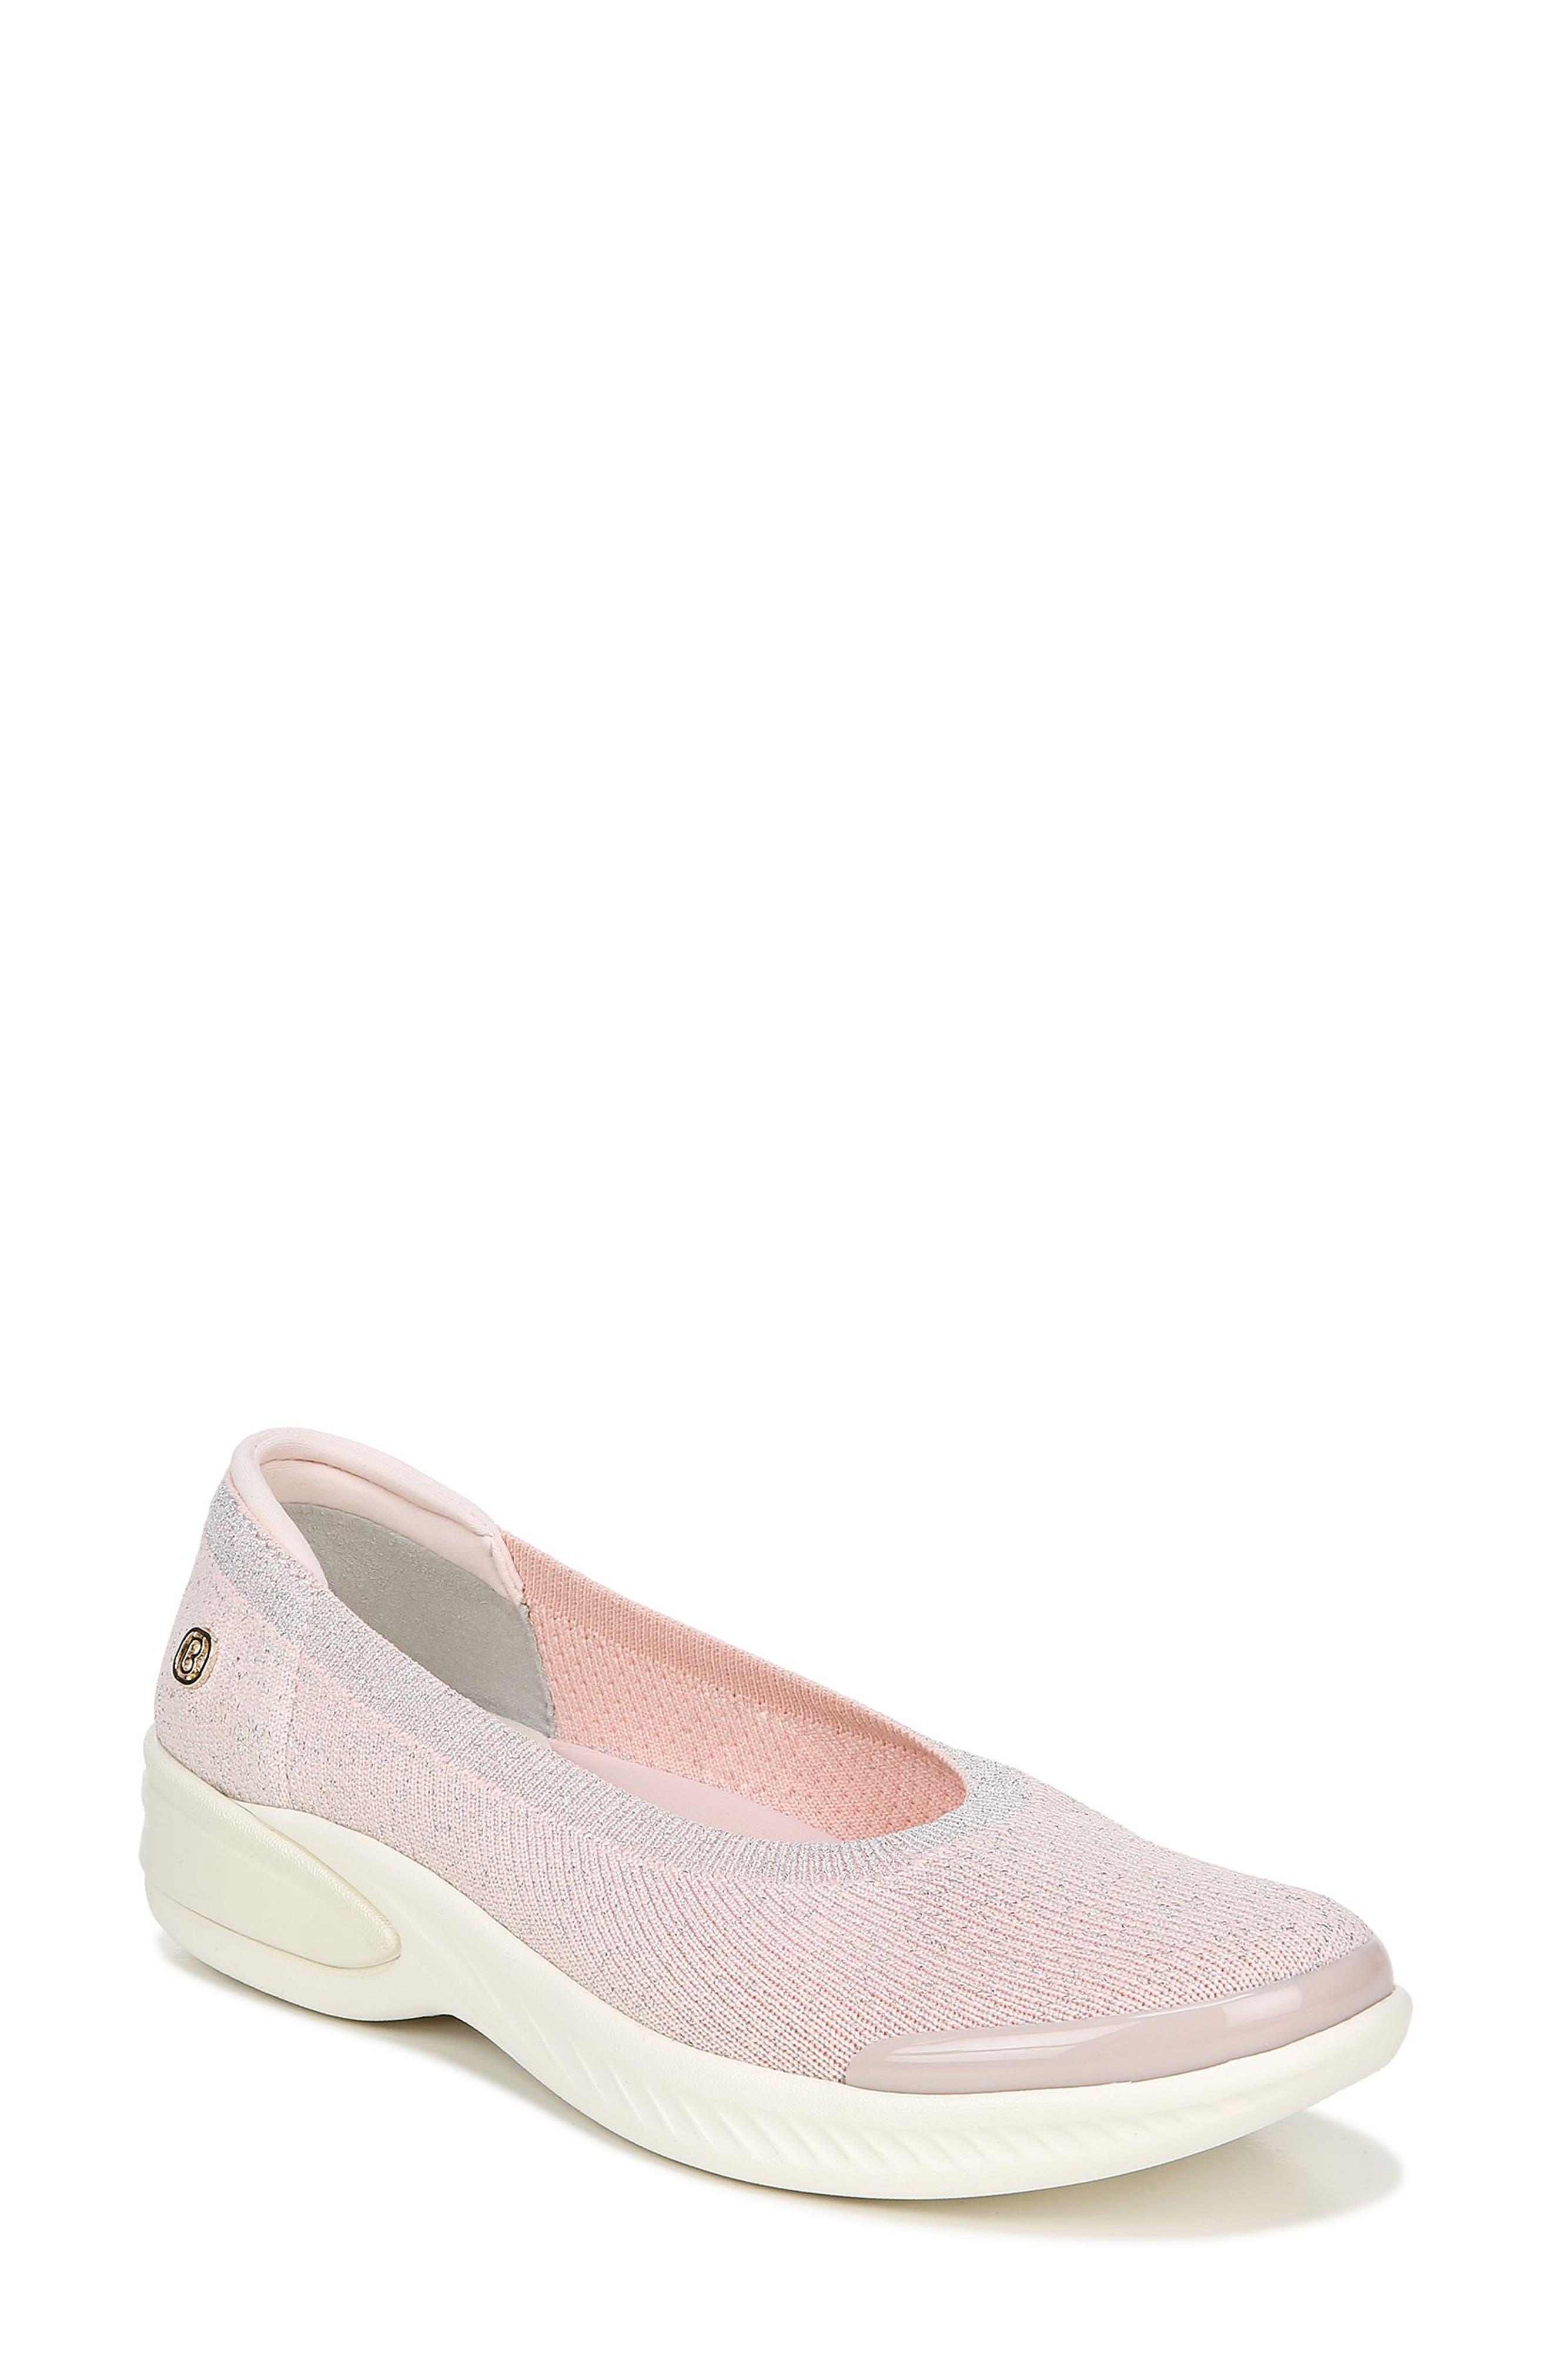 Women's BZees Shoes Sale \u0026 Clearance